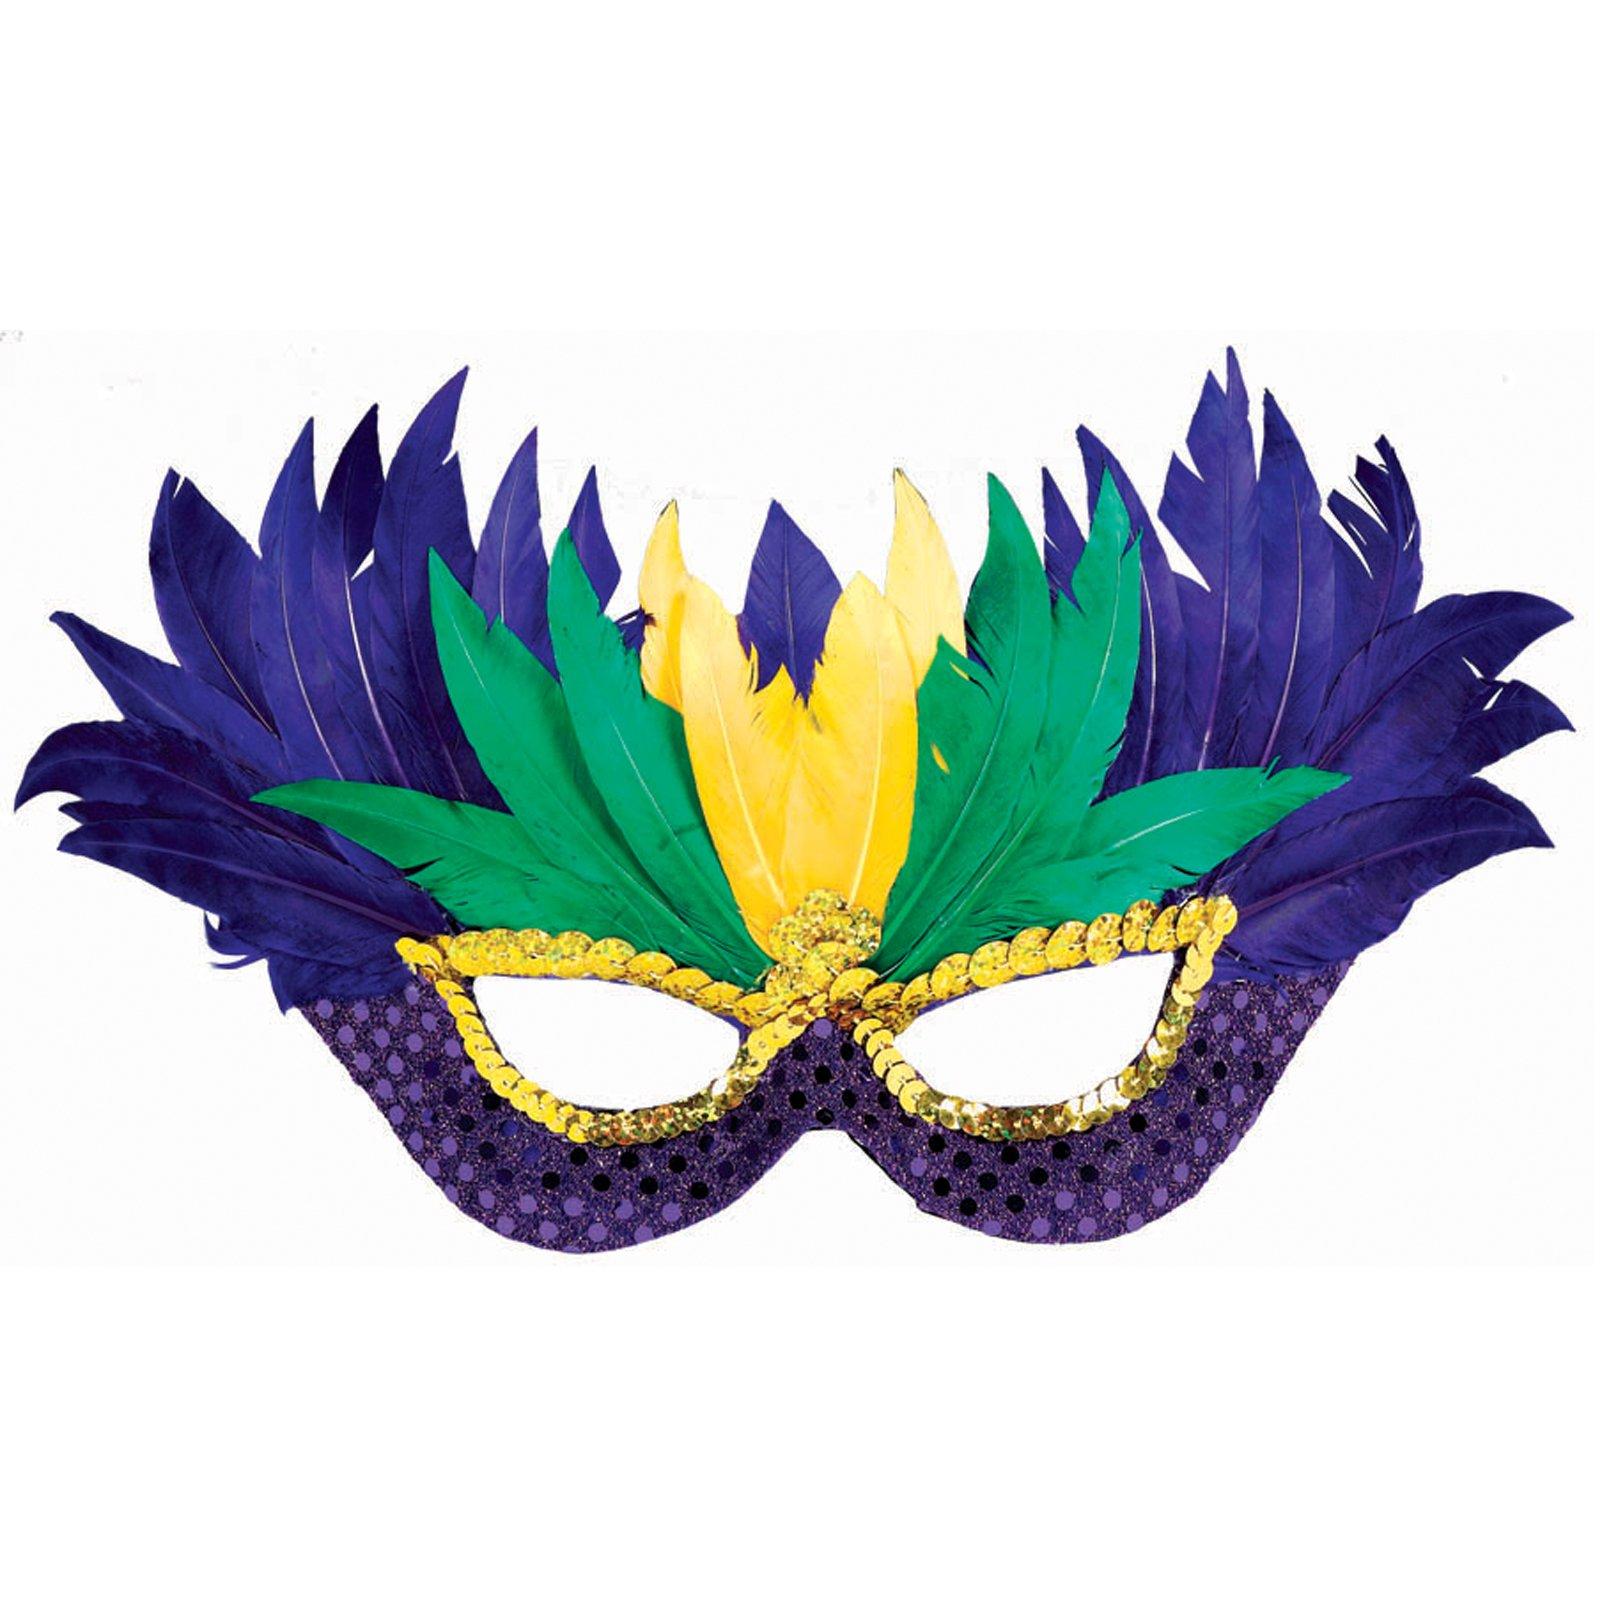 Free Mardi Gras Mask Clipart, Download Free Clip Art, Free.